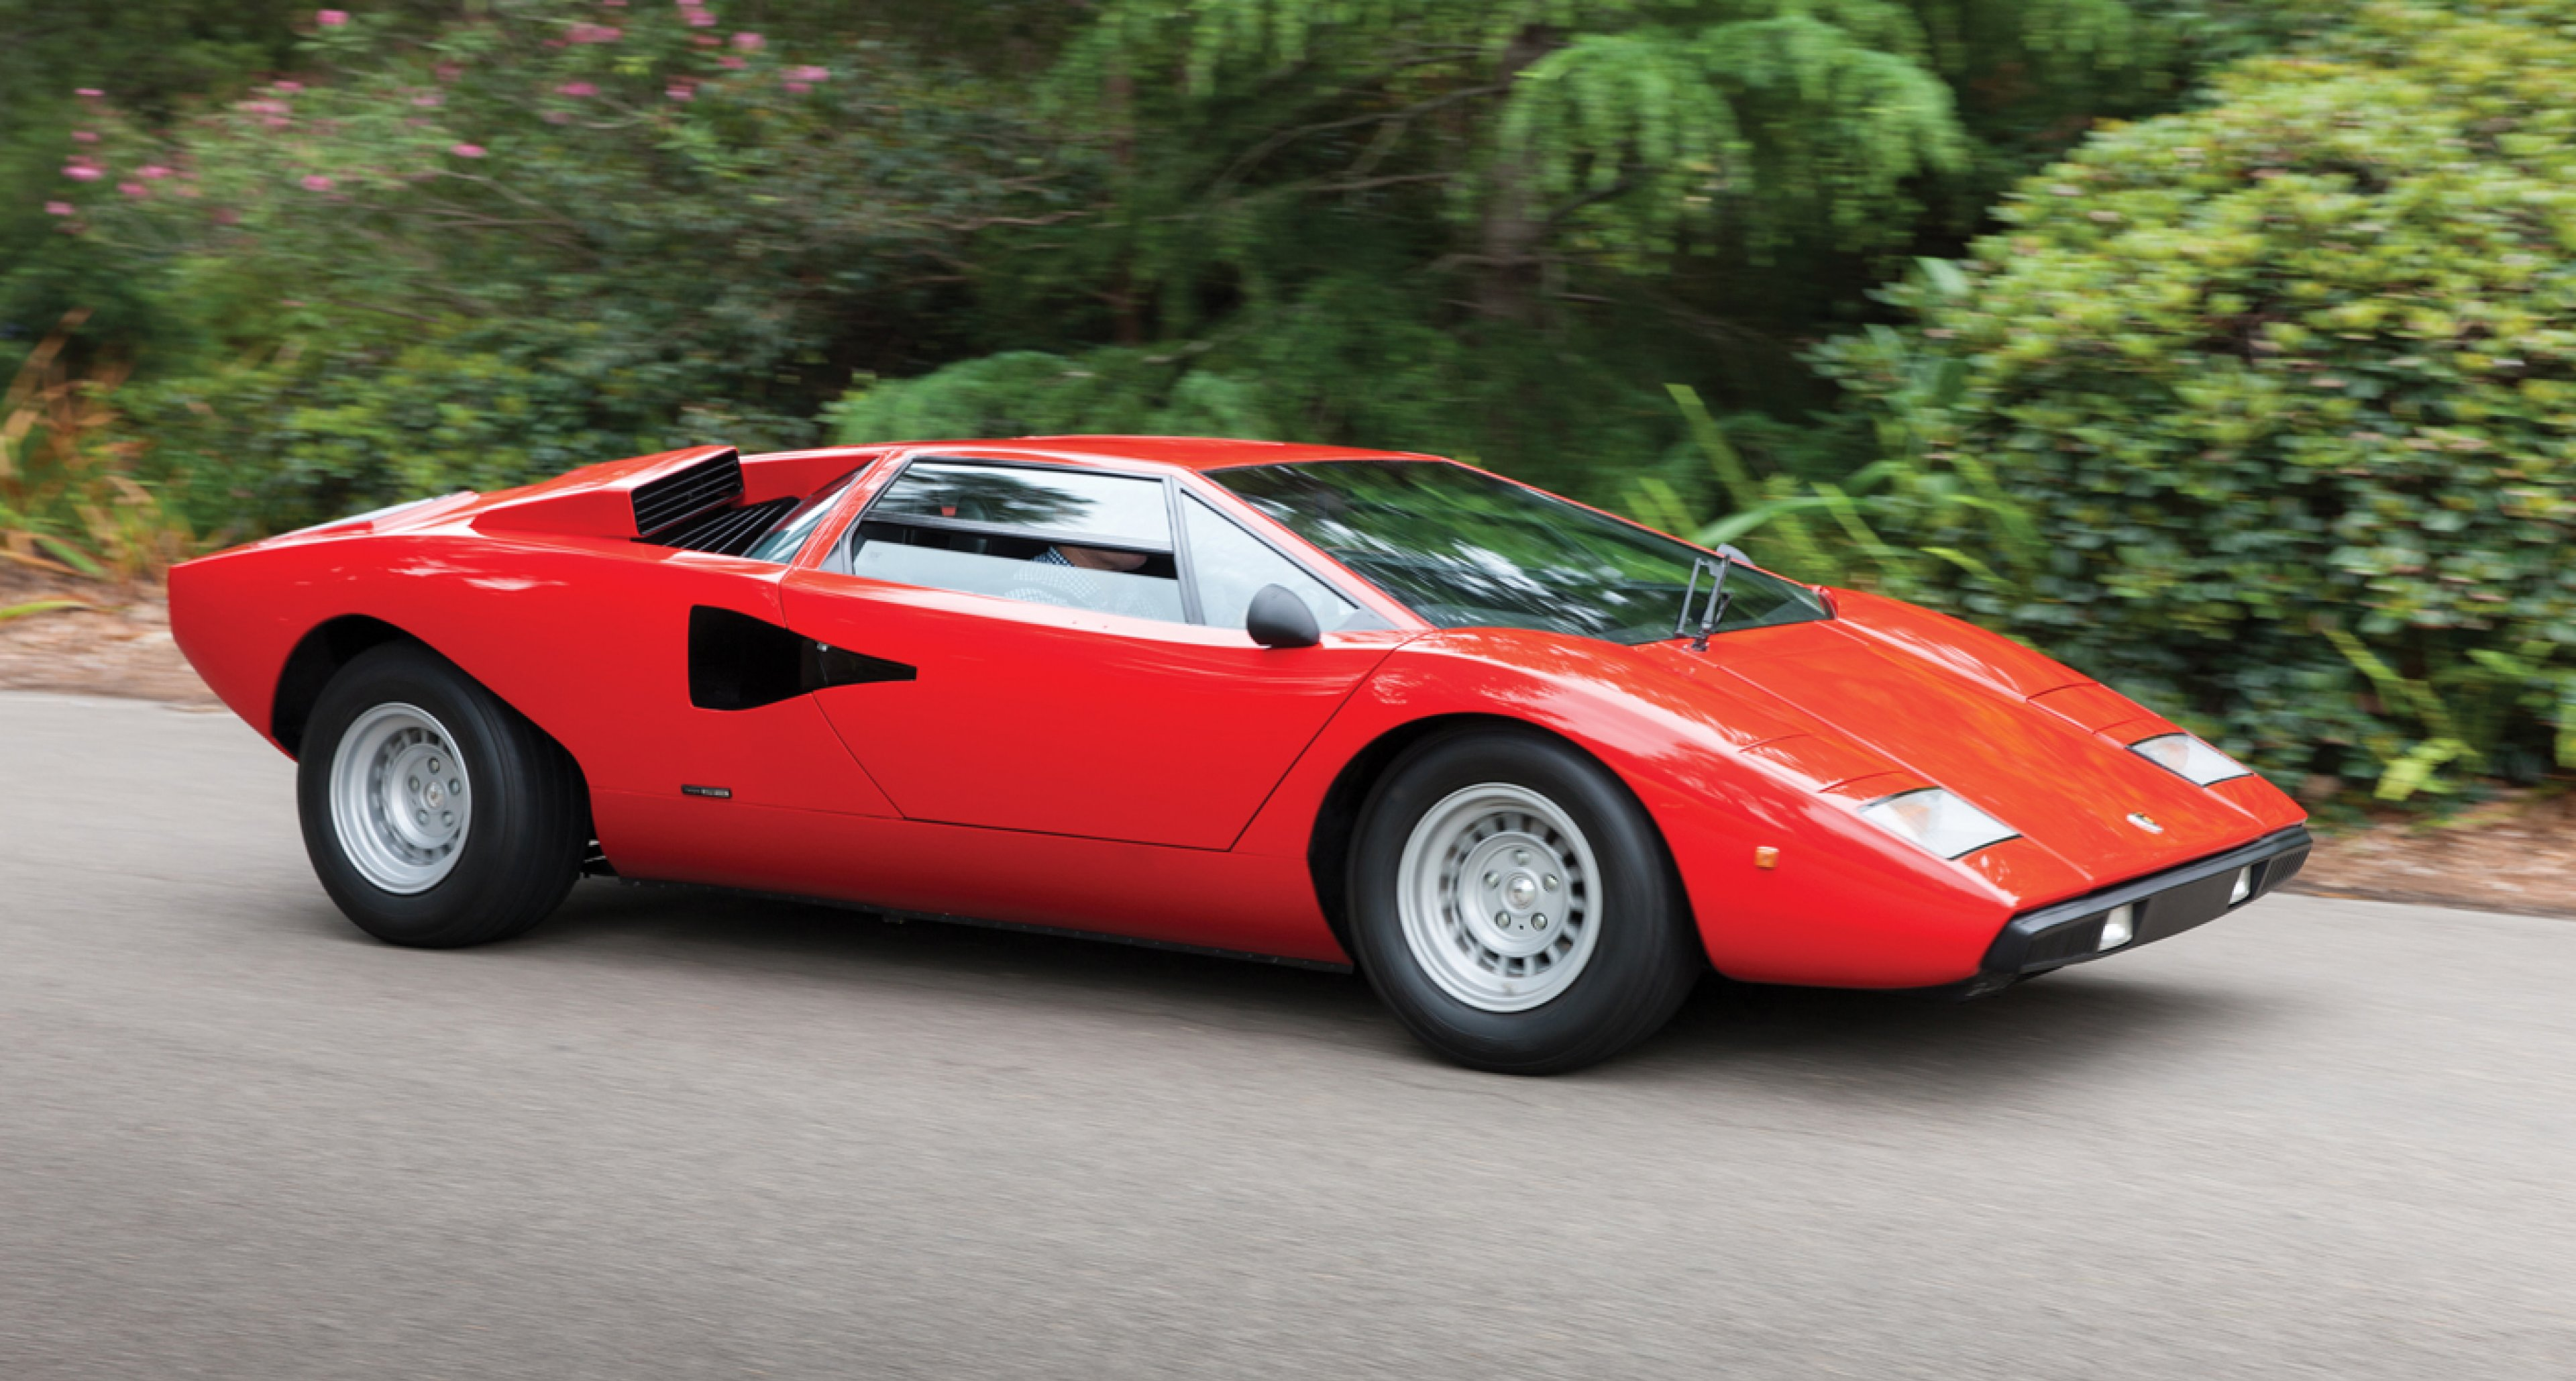 Timeless Classics Lamborghini Countach Lp400 Periscopio Classic